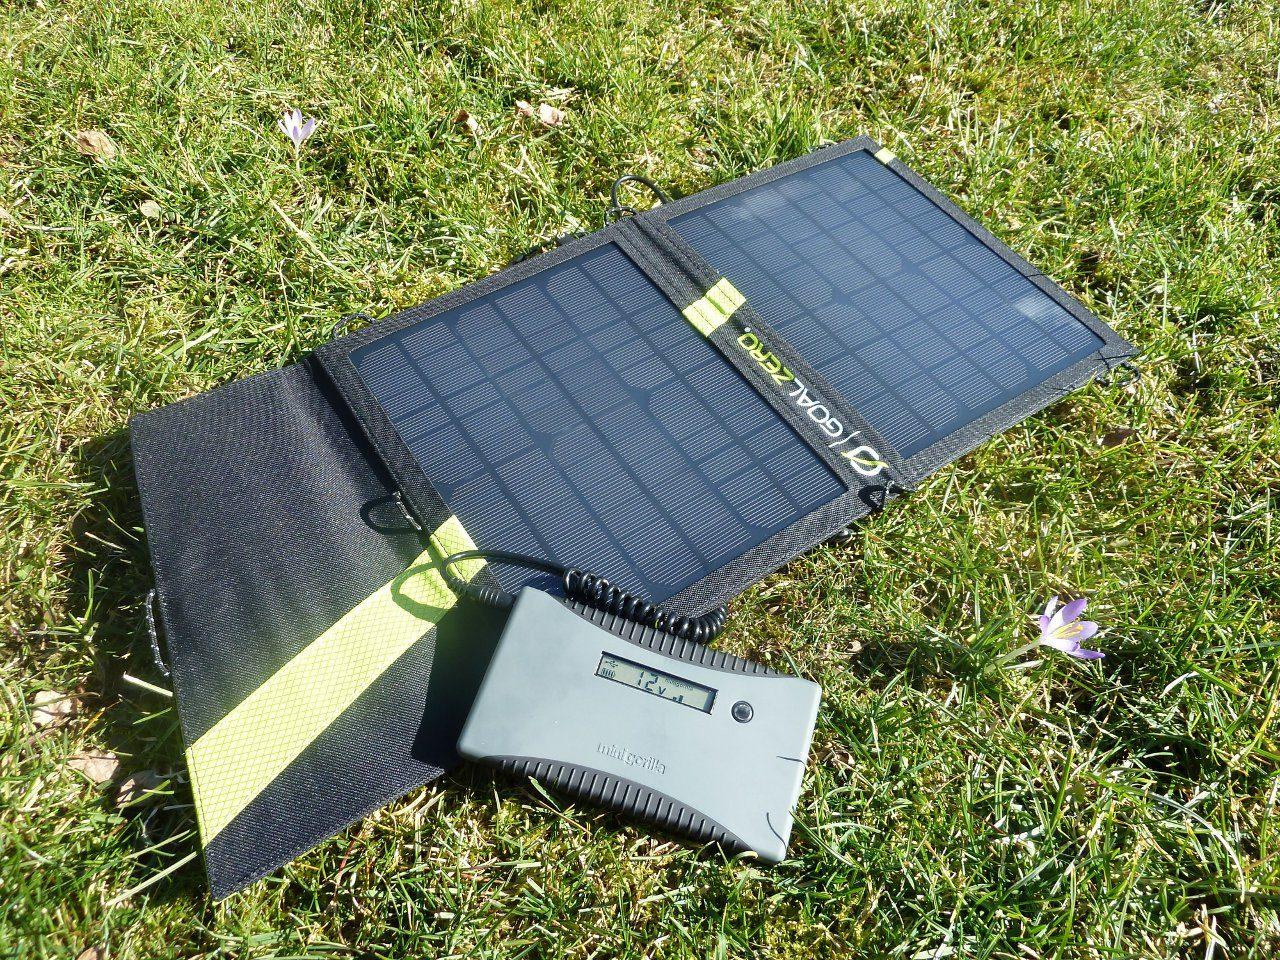 Goal Zero Nomad 13 and Minigorilla Solar Kit